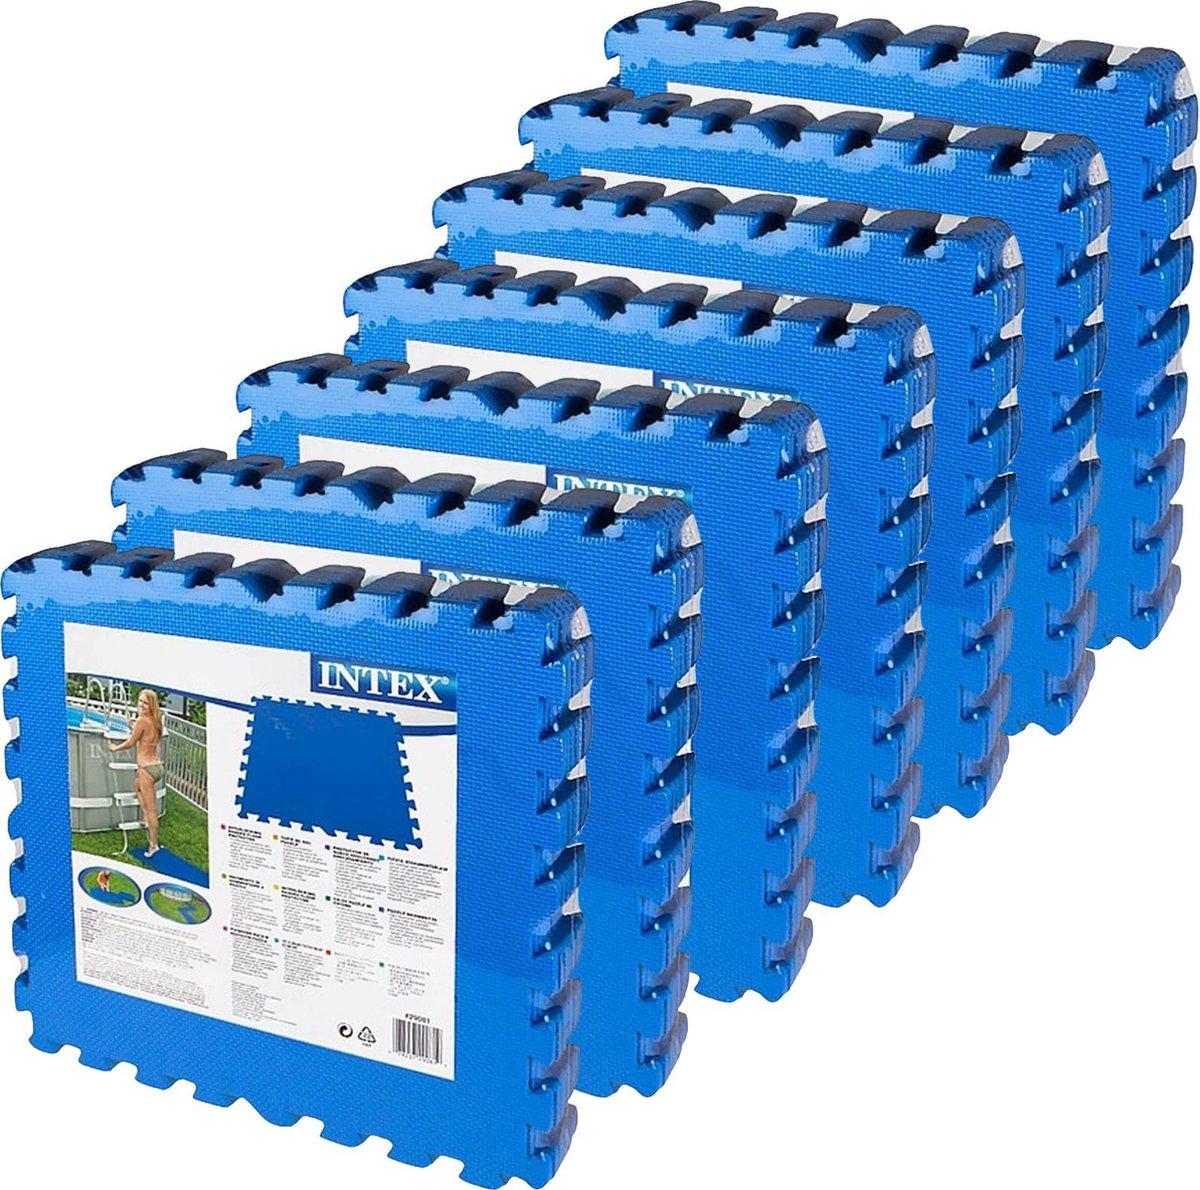 Intex - zwembad tegels - blauw - 50 x 50 cm - 56 tegels - 14 m2 - zwembad ondertegels